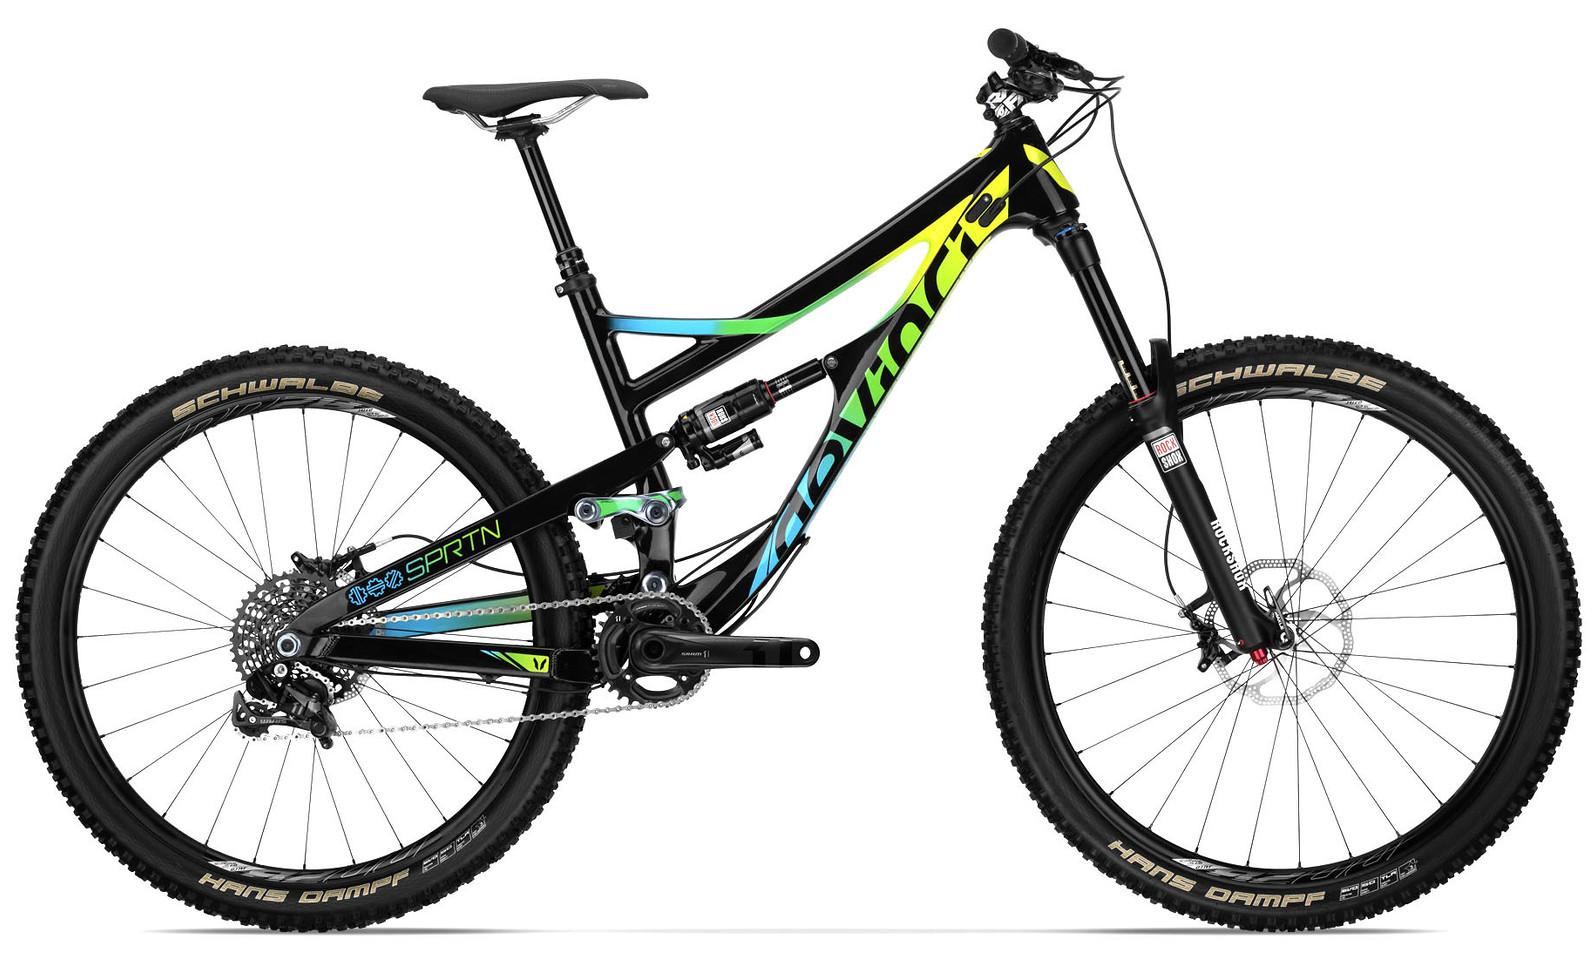 2015 Devinci Spartan Carbon SX  Devinci SPARTAN CARBON SX bike